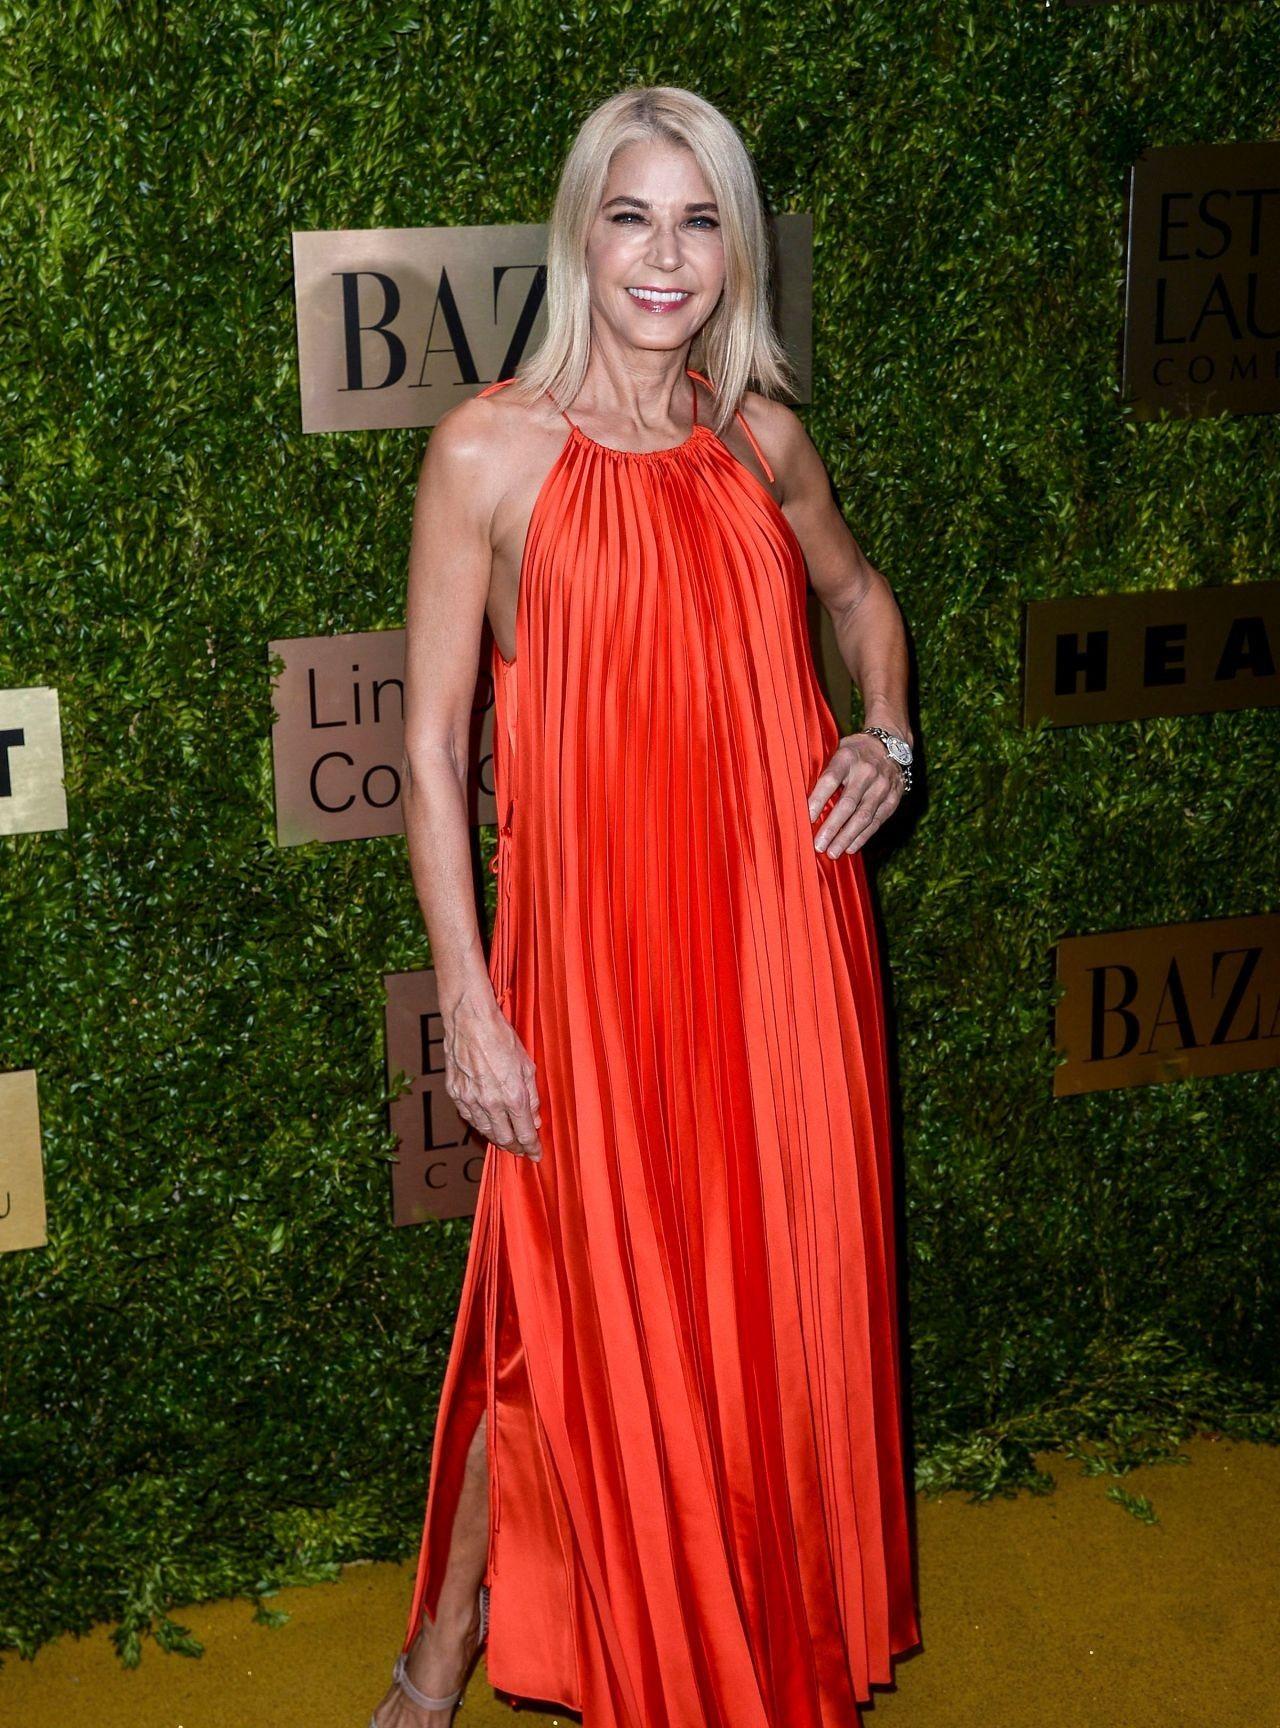 LA娱乐|美国演员坎蒂丝·布希奈儿,出席纽约林肯中心时尚晚会